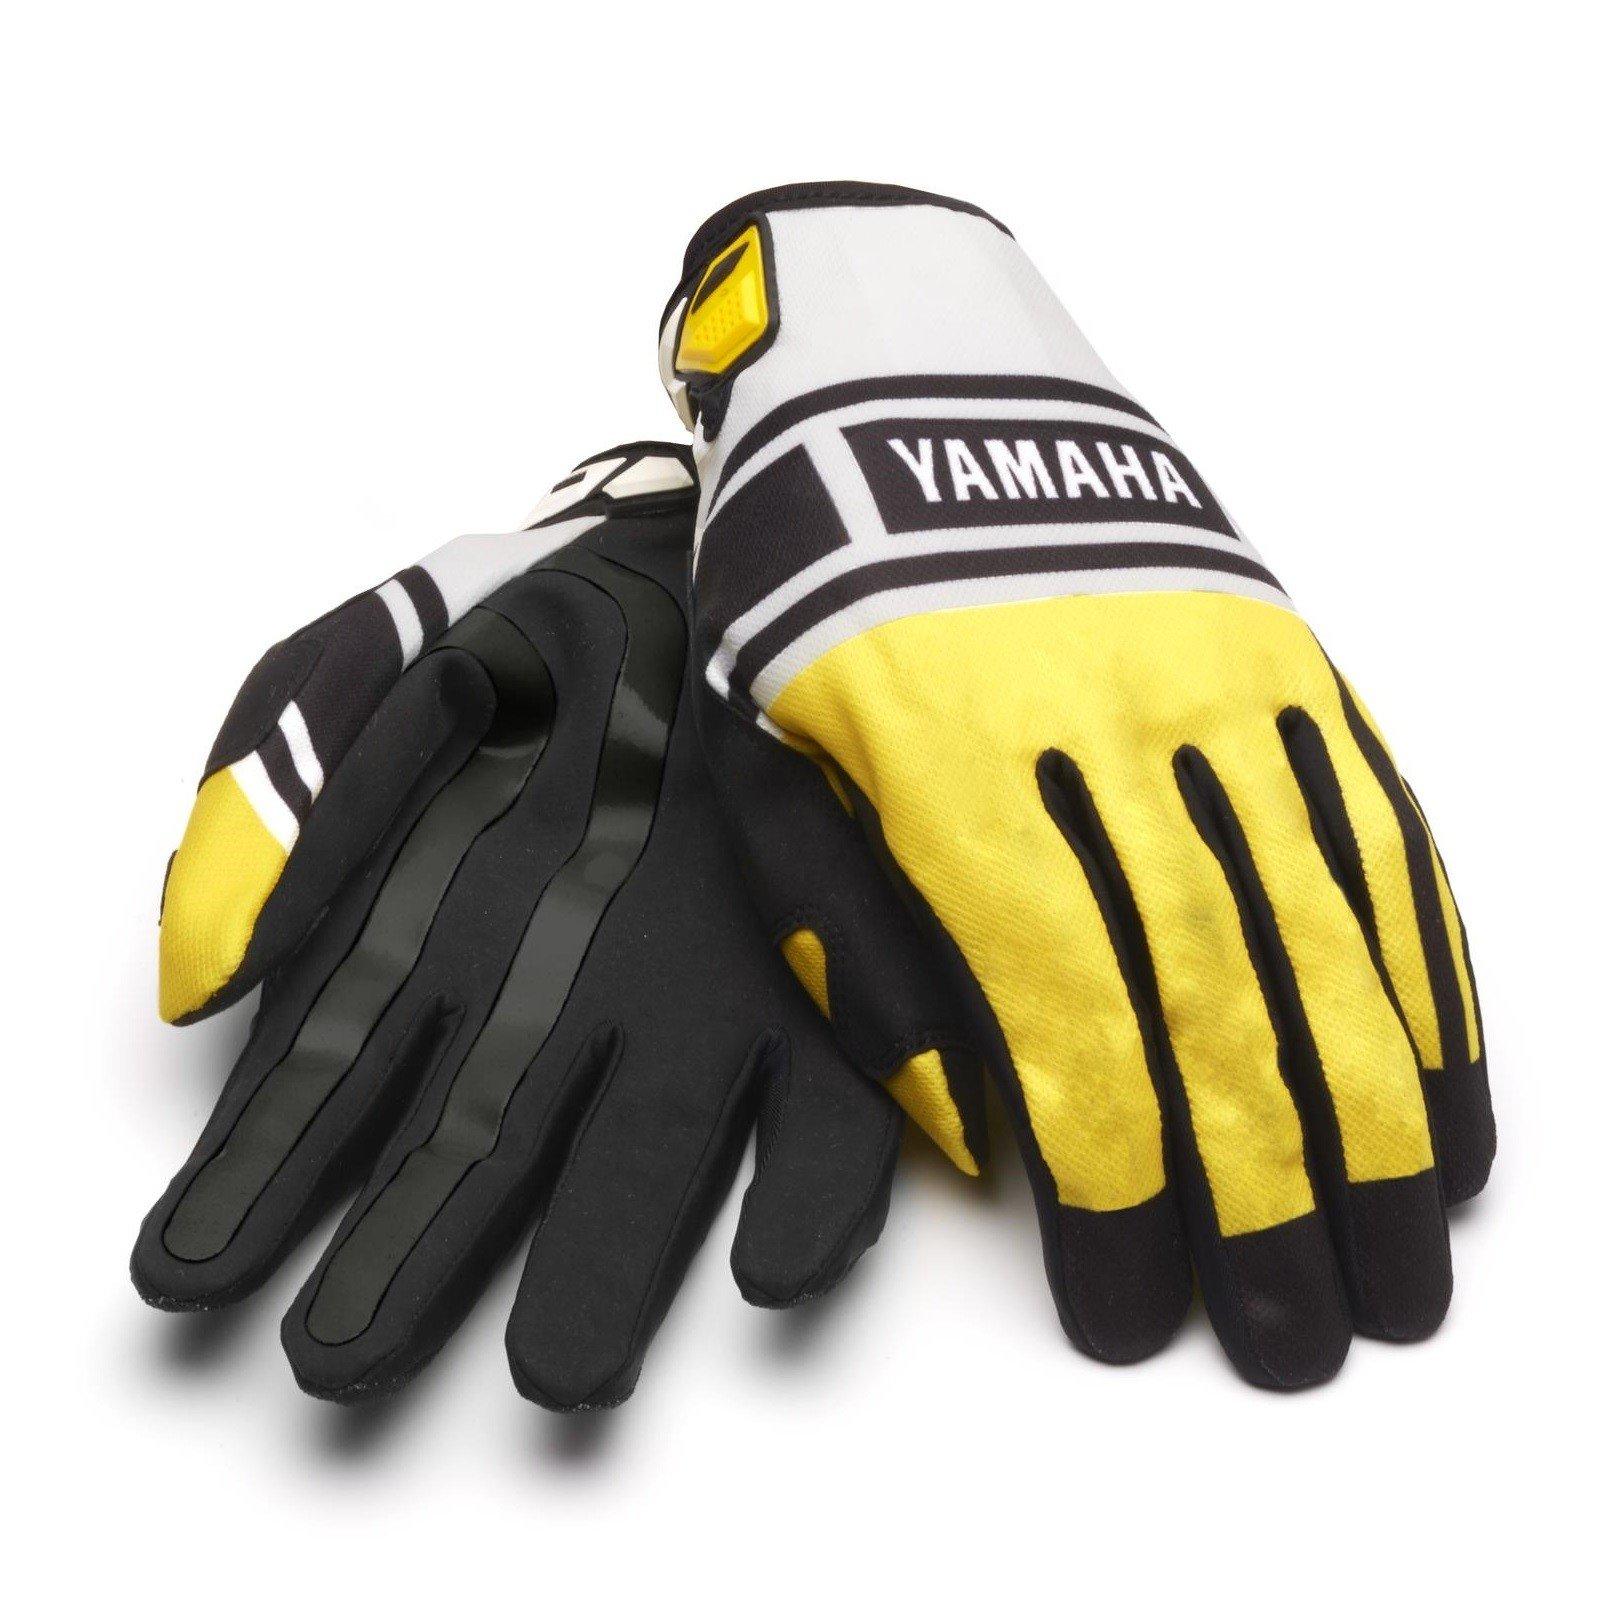 Pánské motokrosové rukavice Yamaha 60th Anniversary 2015 (žluté) S